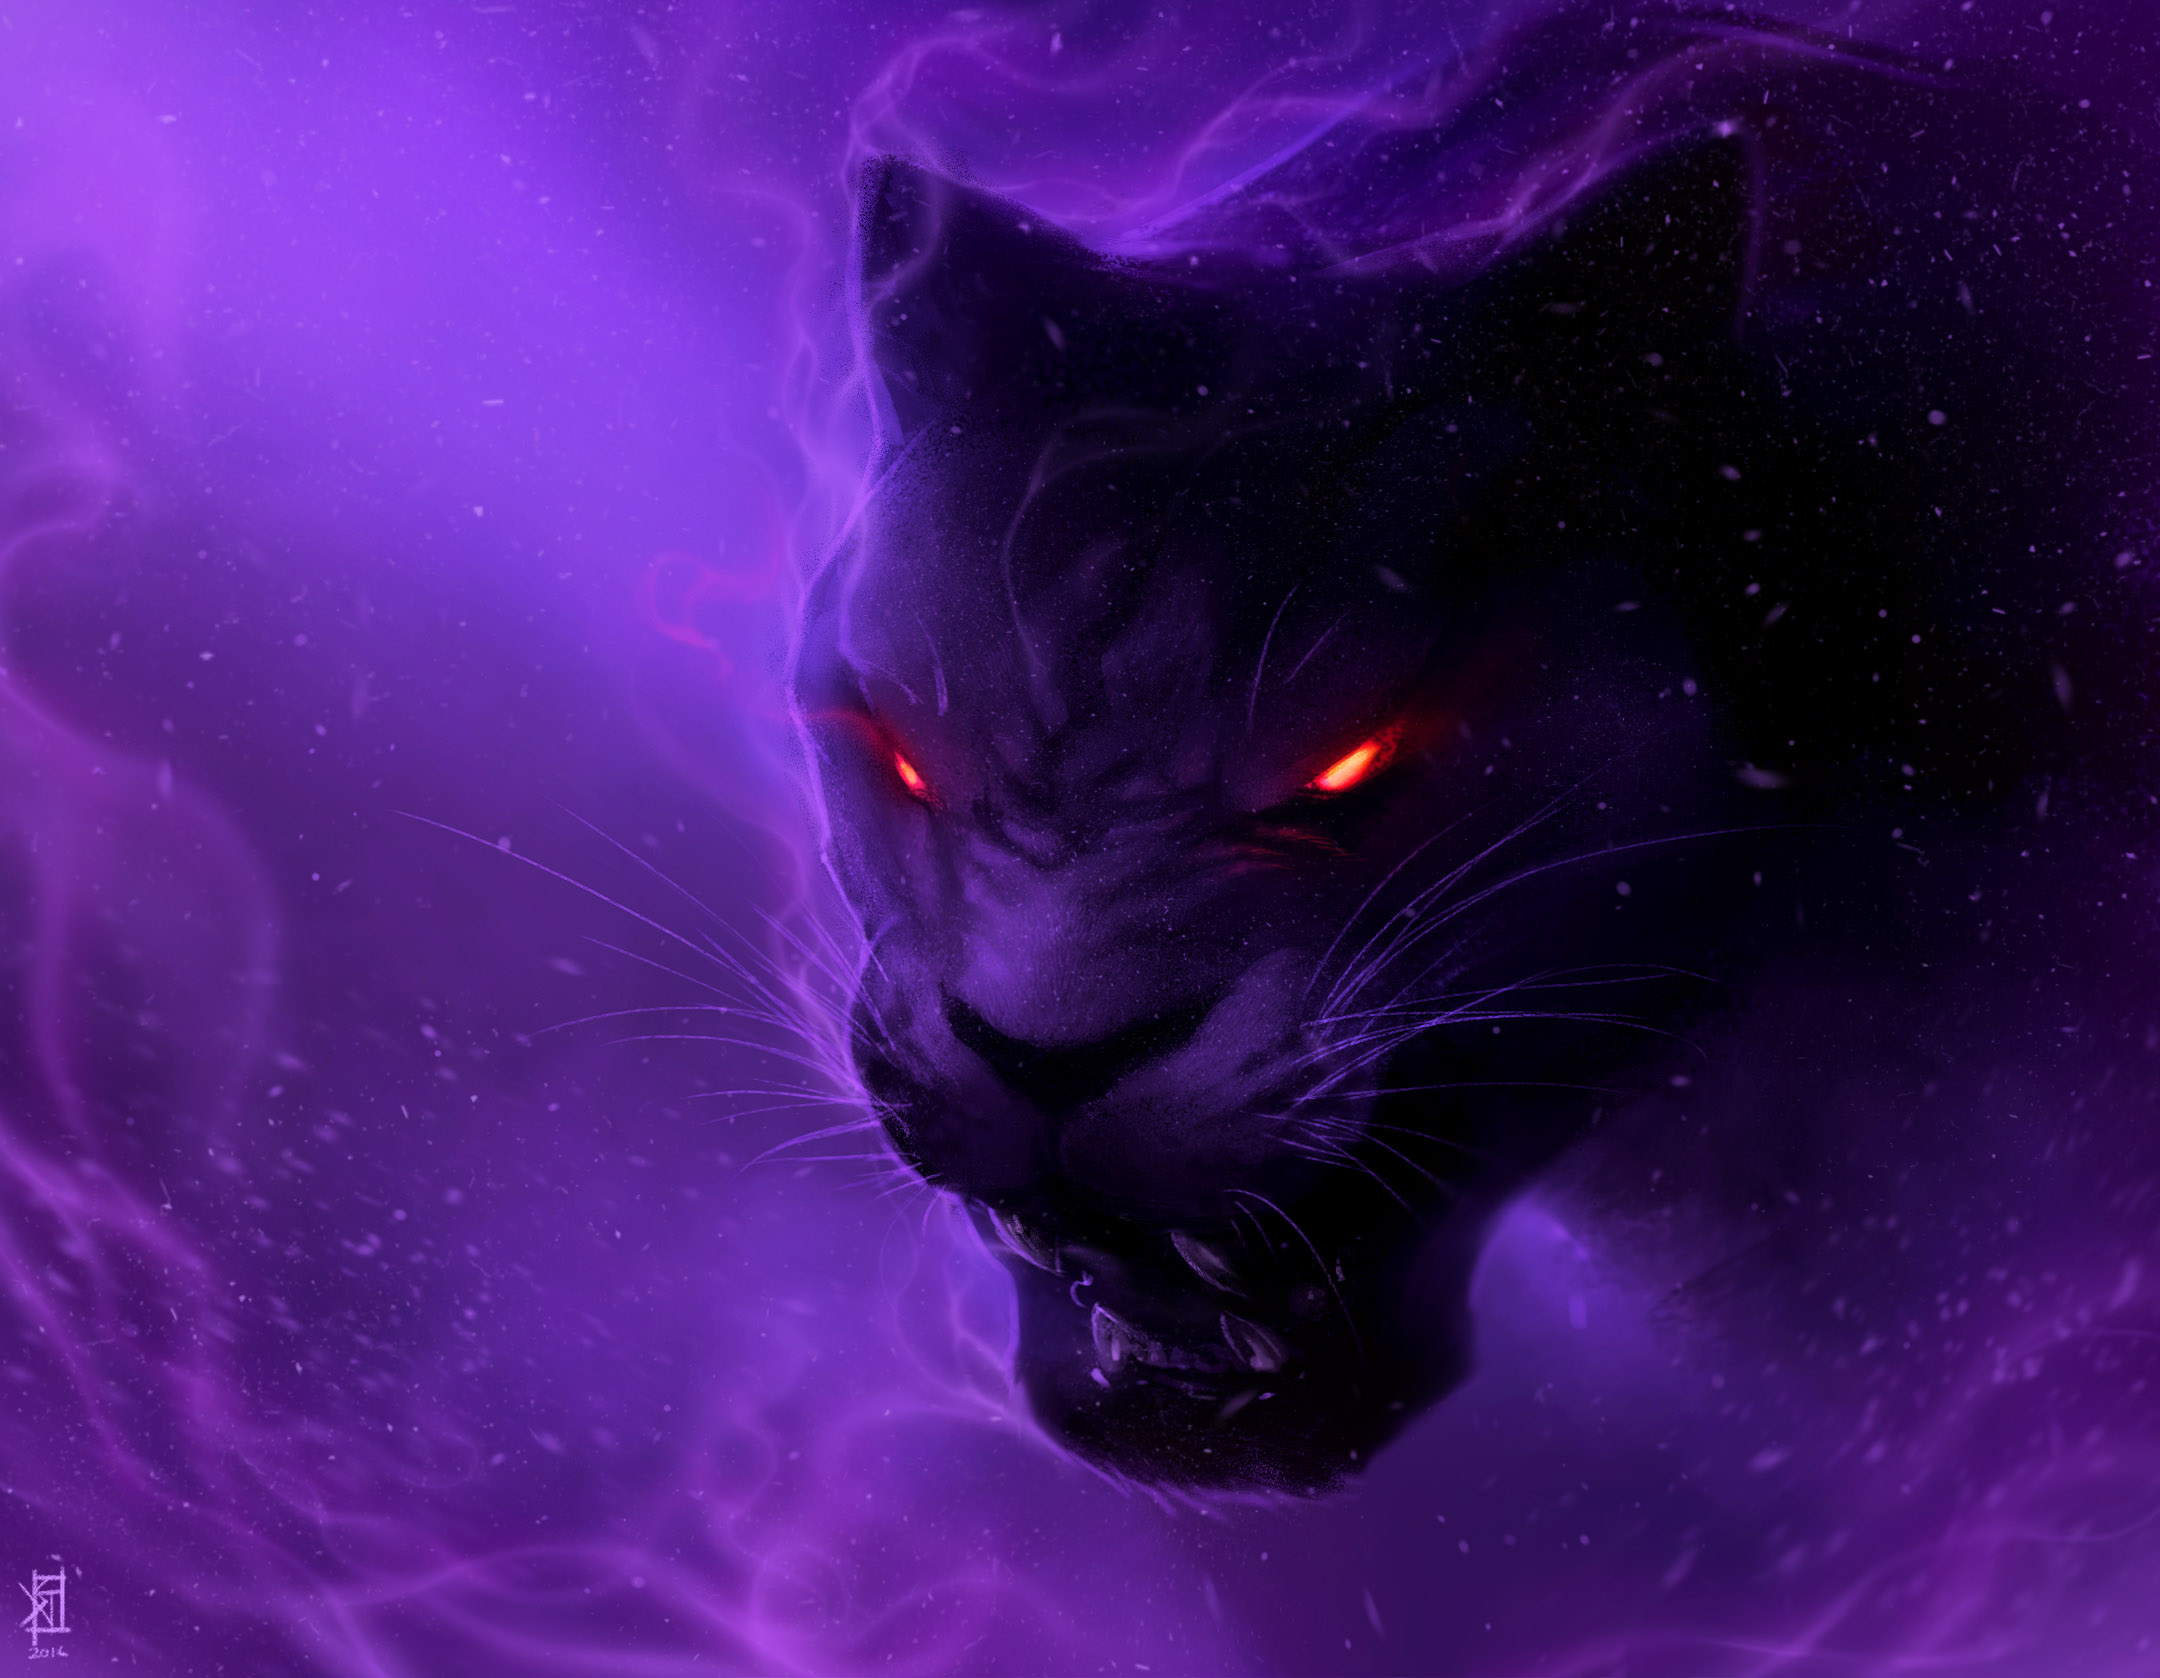 Black Panther Animal Wallpaper Black Panther Digital Art Illustration Hd Artist 4k